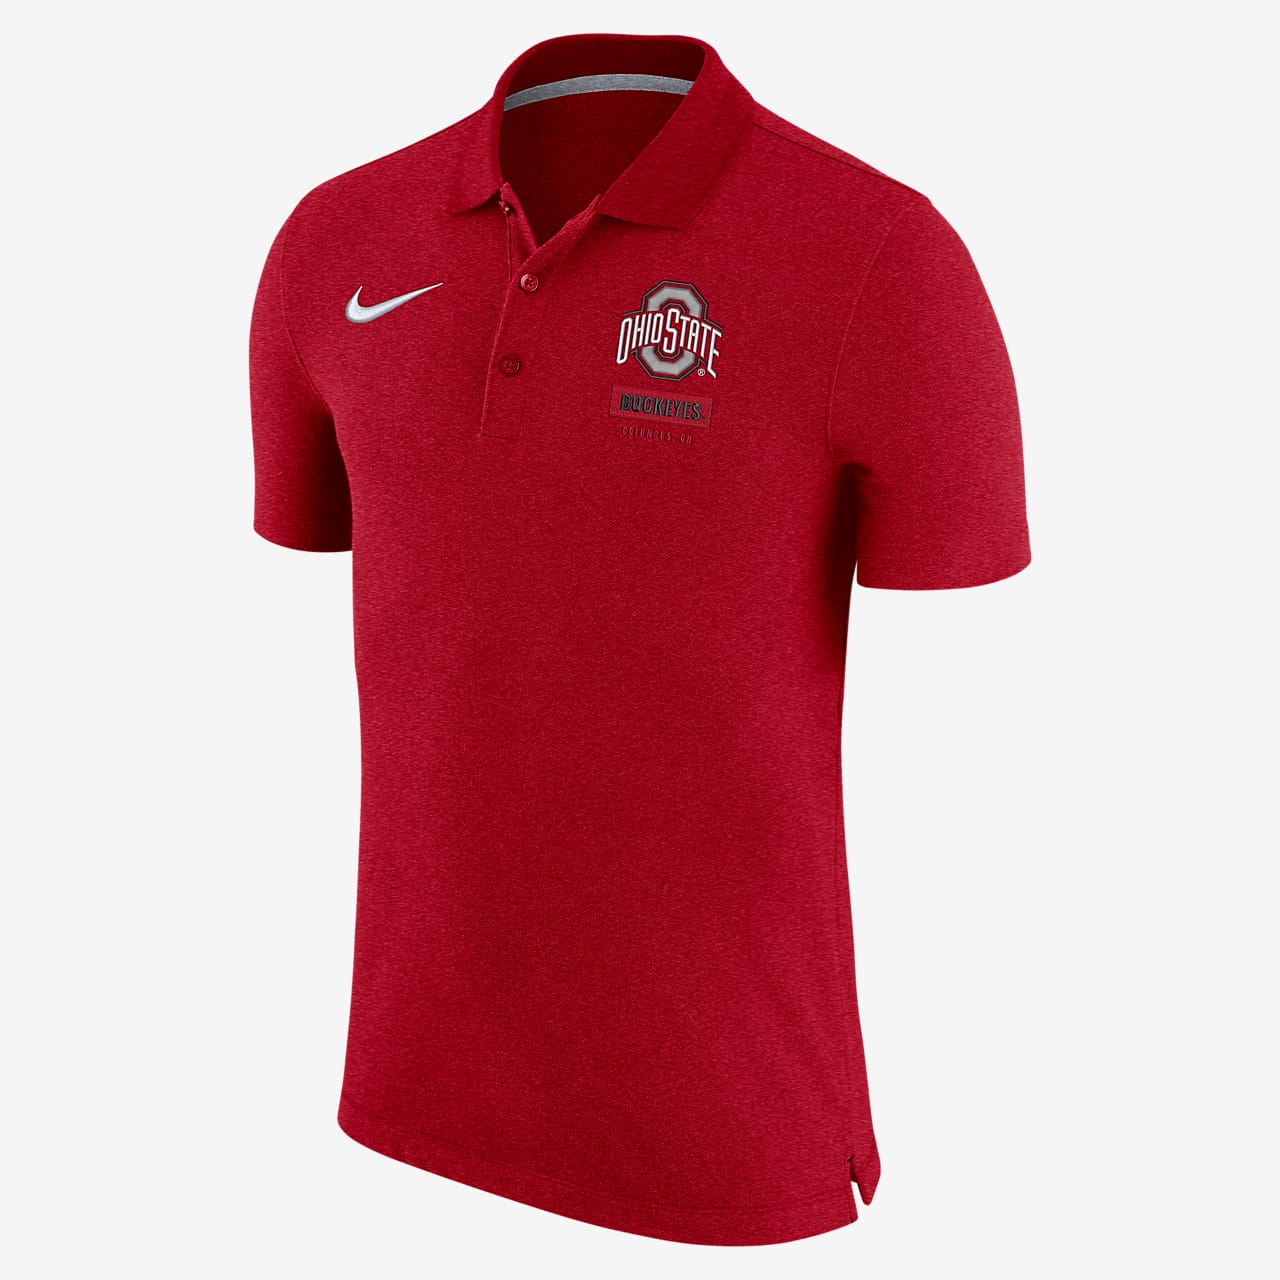 Nike College (Ohio State) Men's Polo